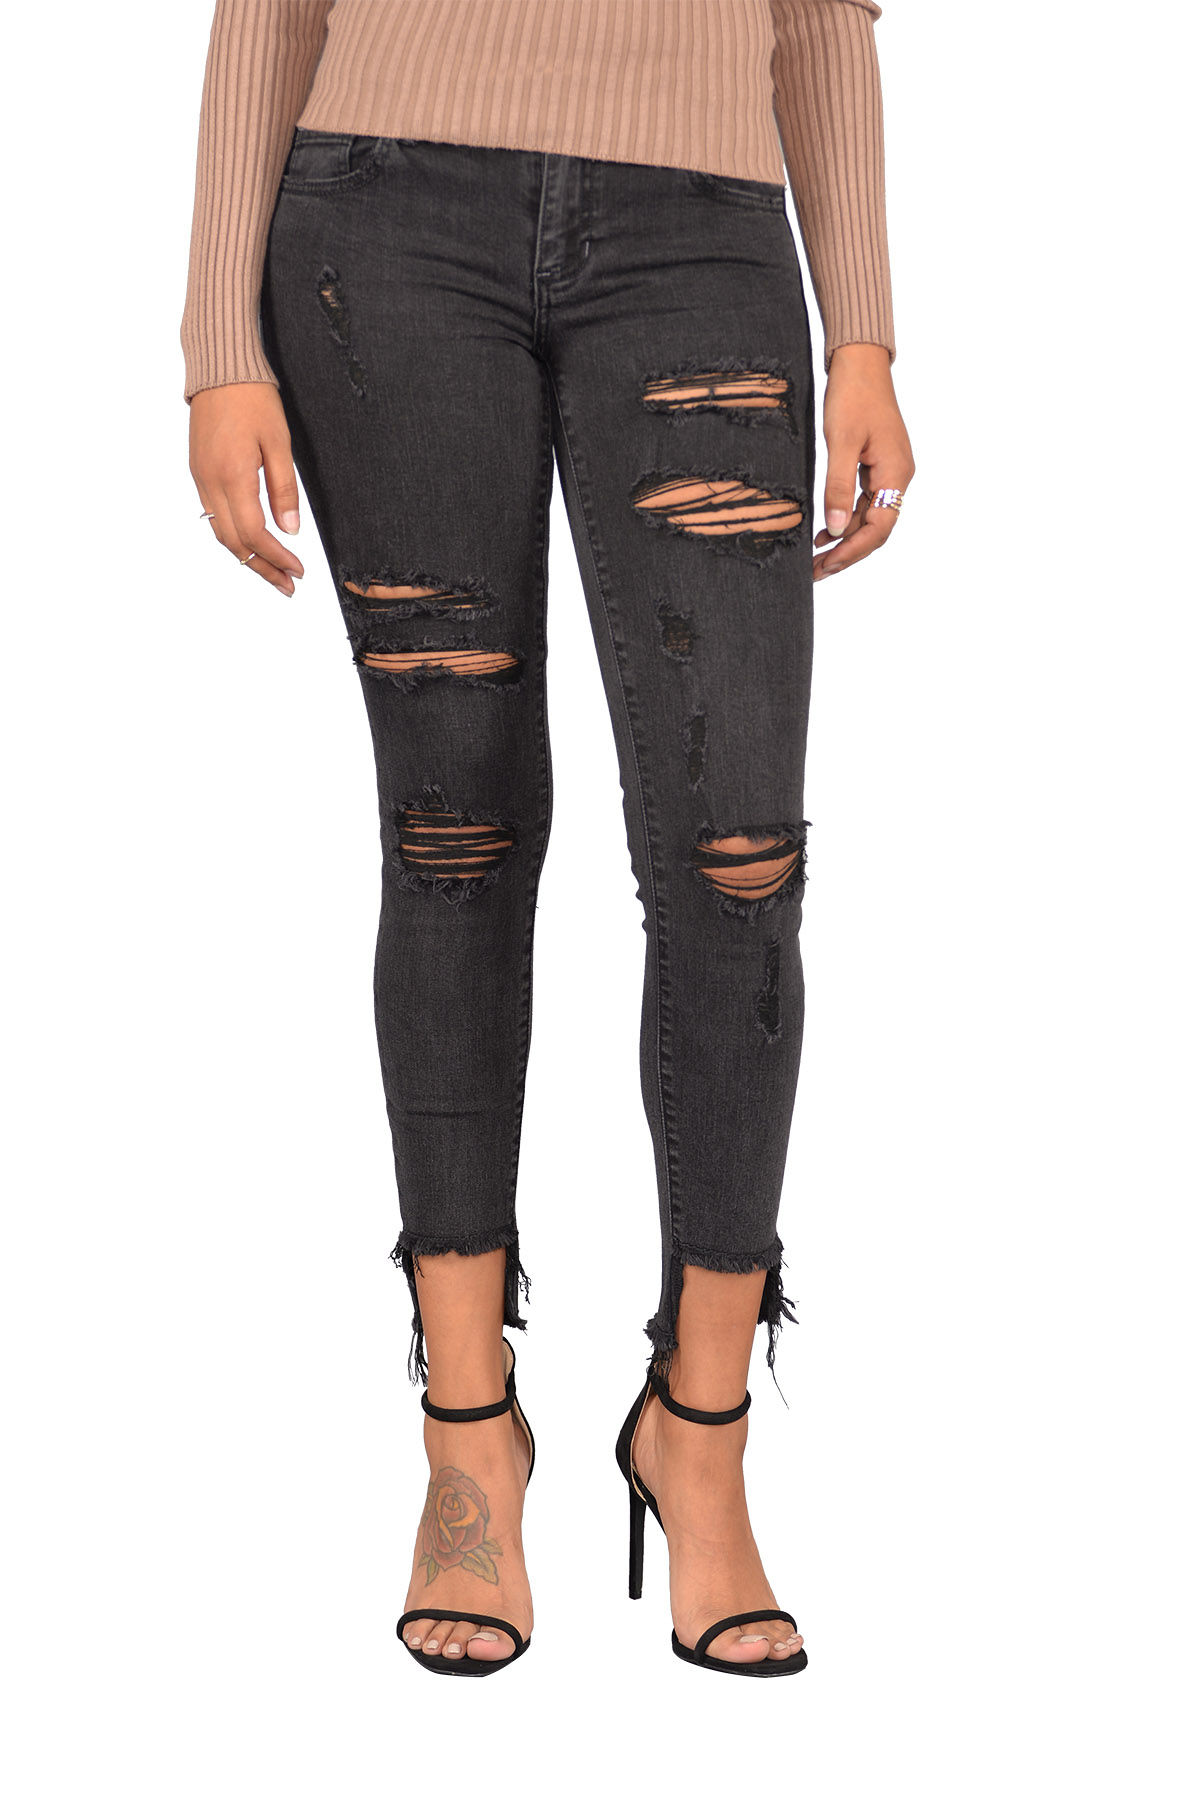 Image of Mid Rise Distressed Step Hem w/ Raw Cut Jeans